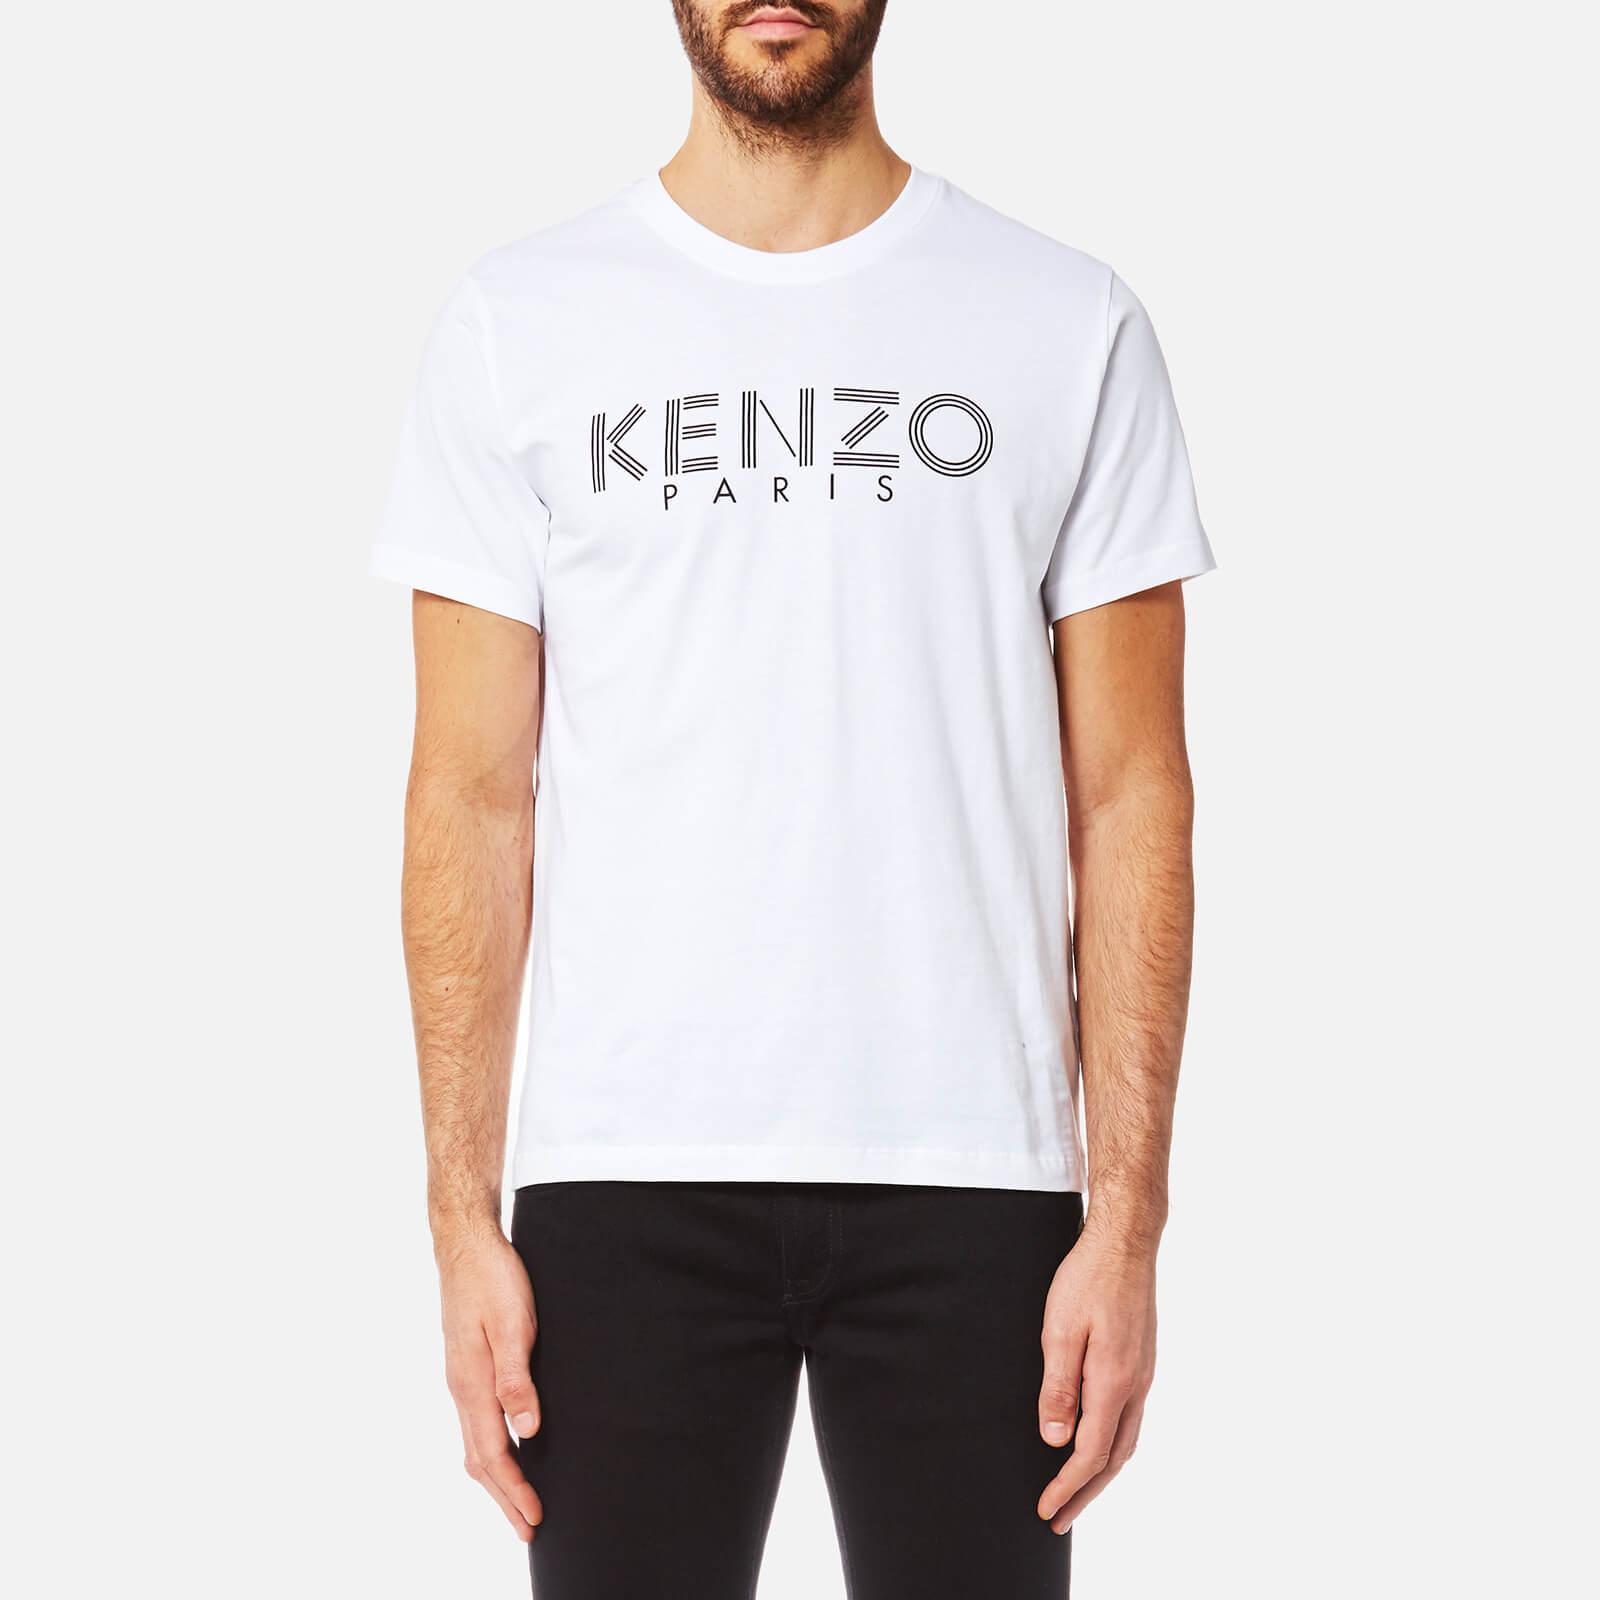 02f5adb451e8 KENZO Men's KENZO Paris T-Shirt - White - Free UK Delivery over £50